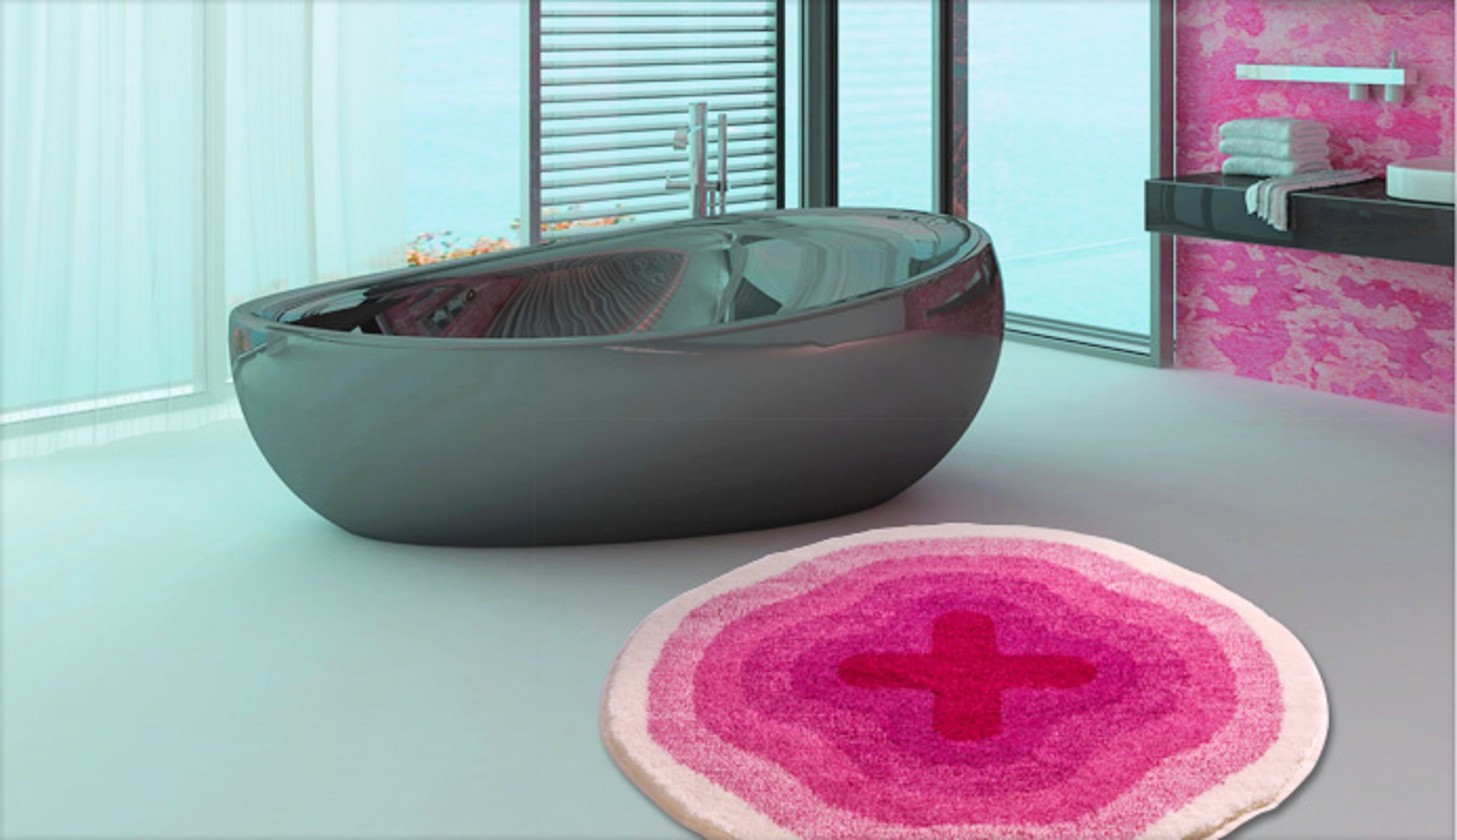 Karim 03 - Předložka kruh 90 cm (ružová)